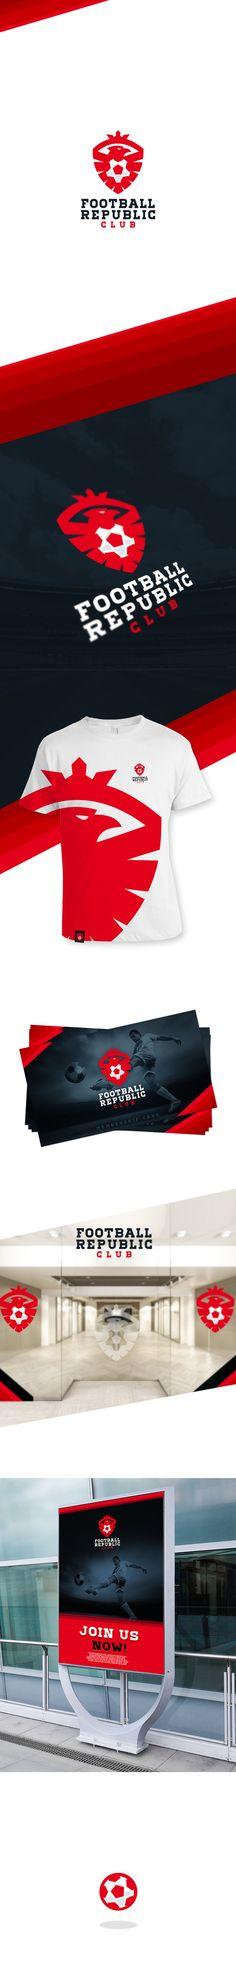 Football Republic Club by Karol Sidorowski, via Behance -- great logo / brand design for soccer!